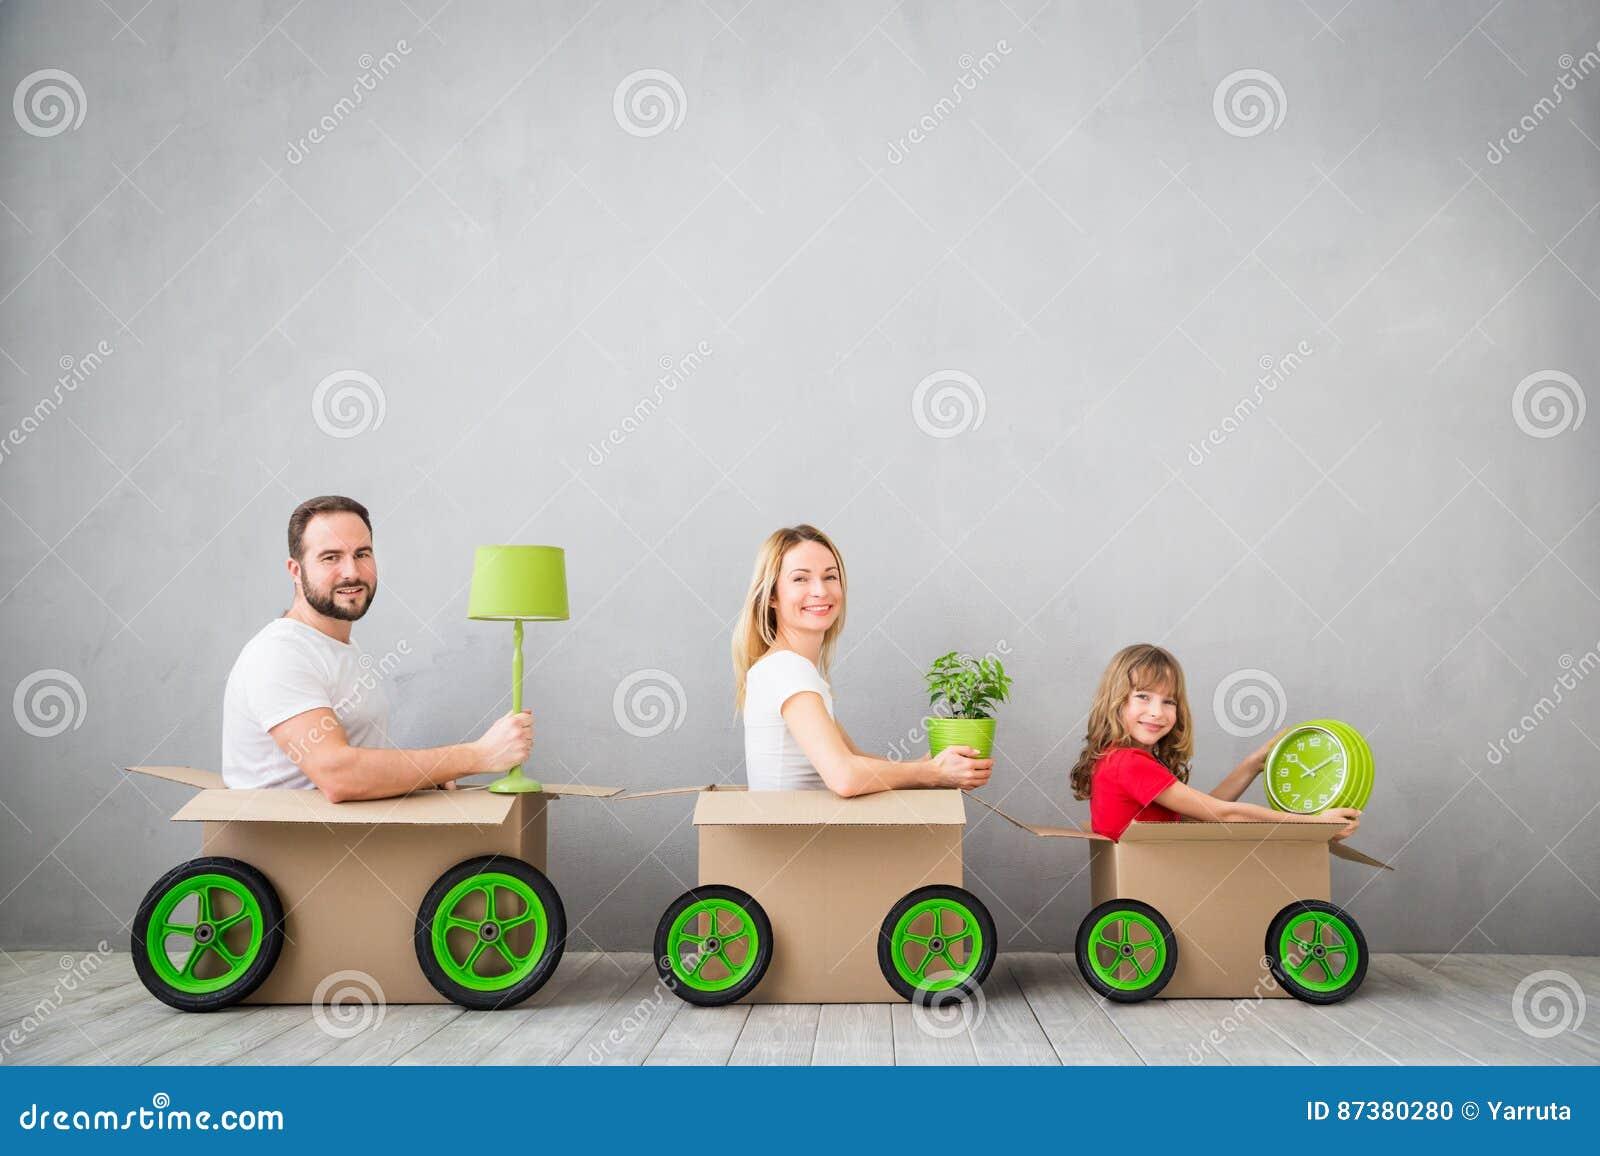 Концепция дома дня семьи новая домашняя Moving